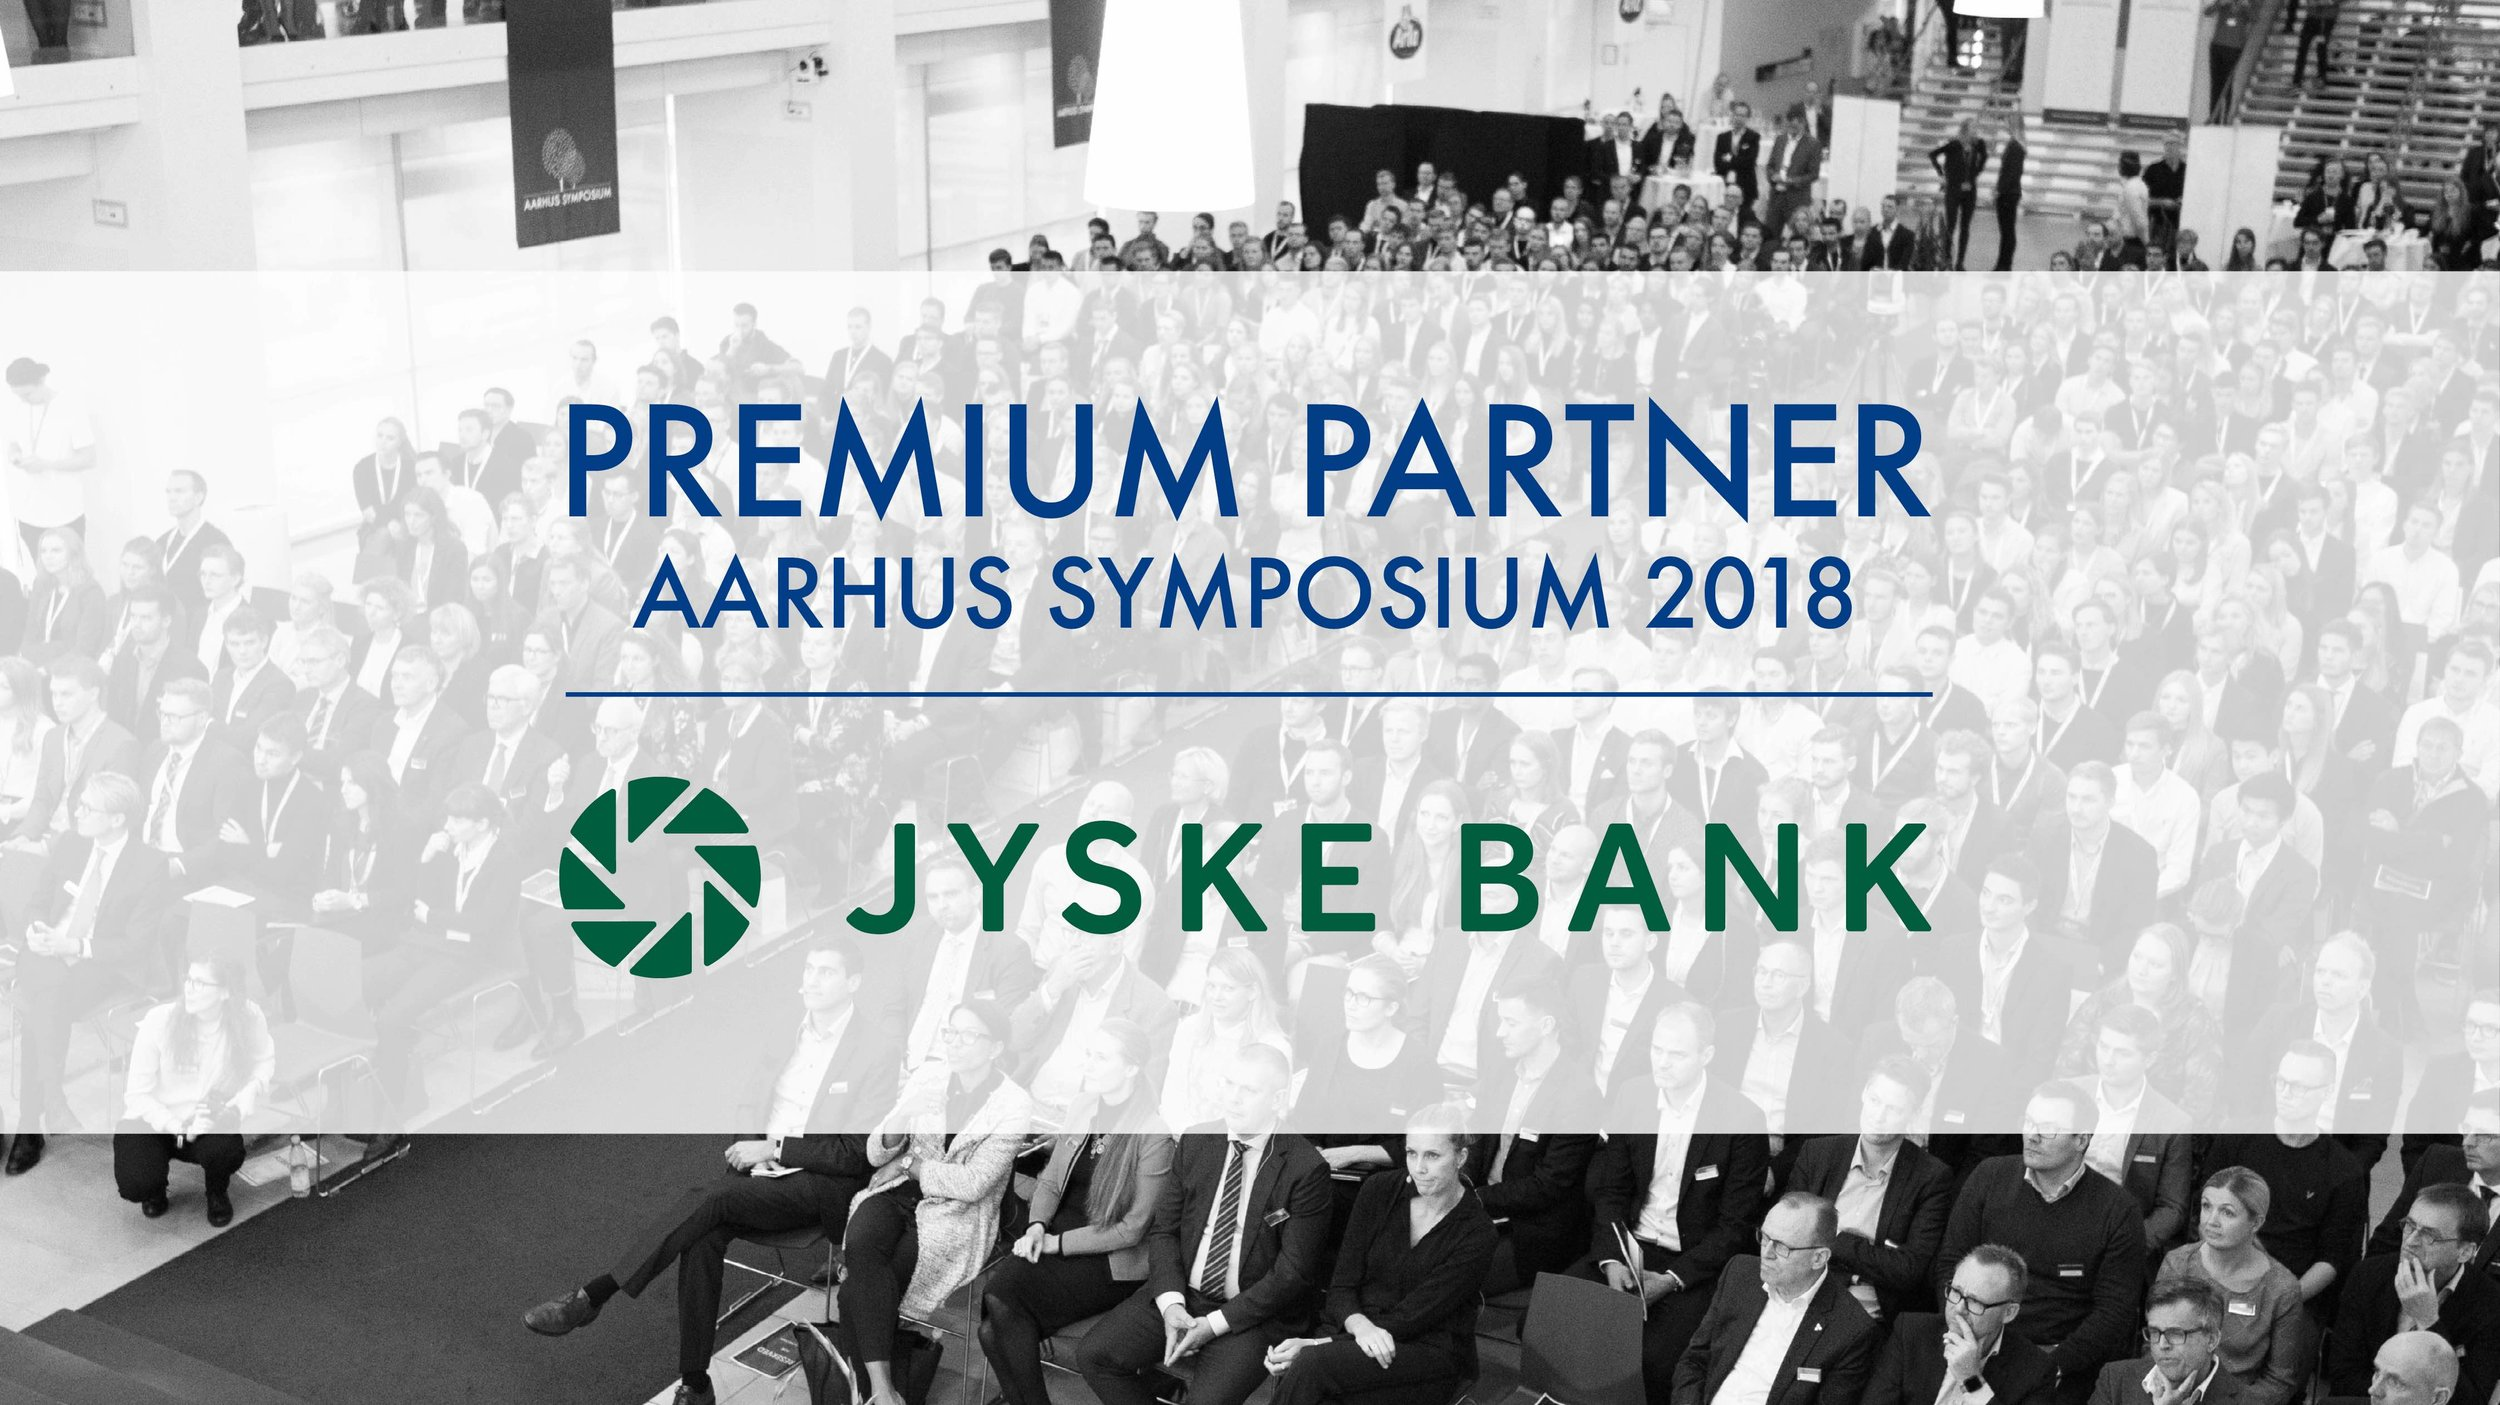 Jyskebank_WEB_v1.jpg